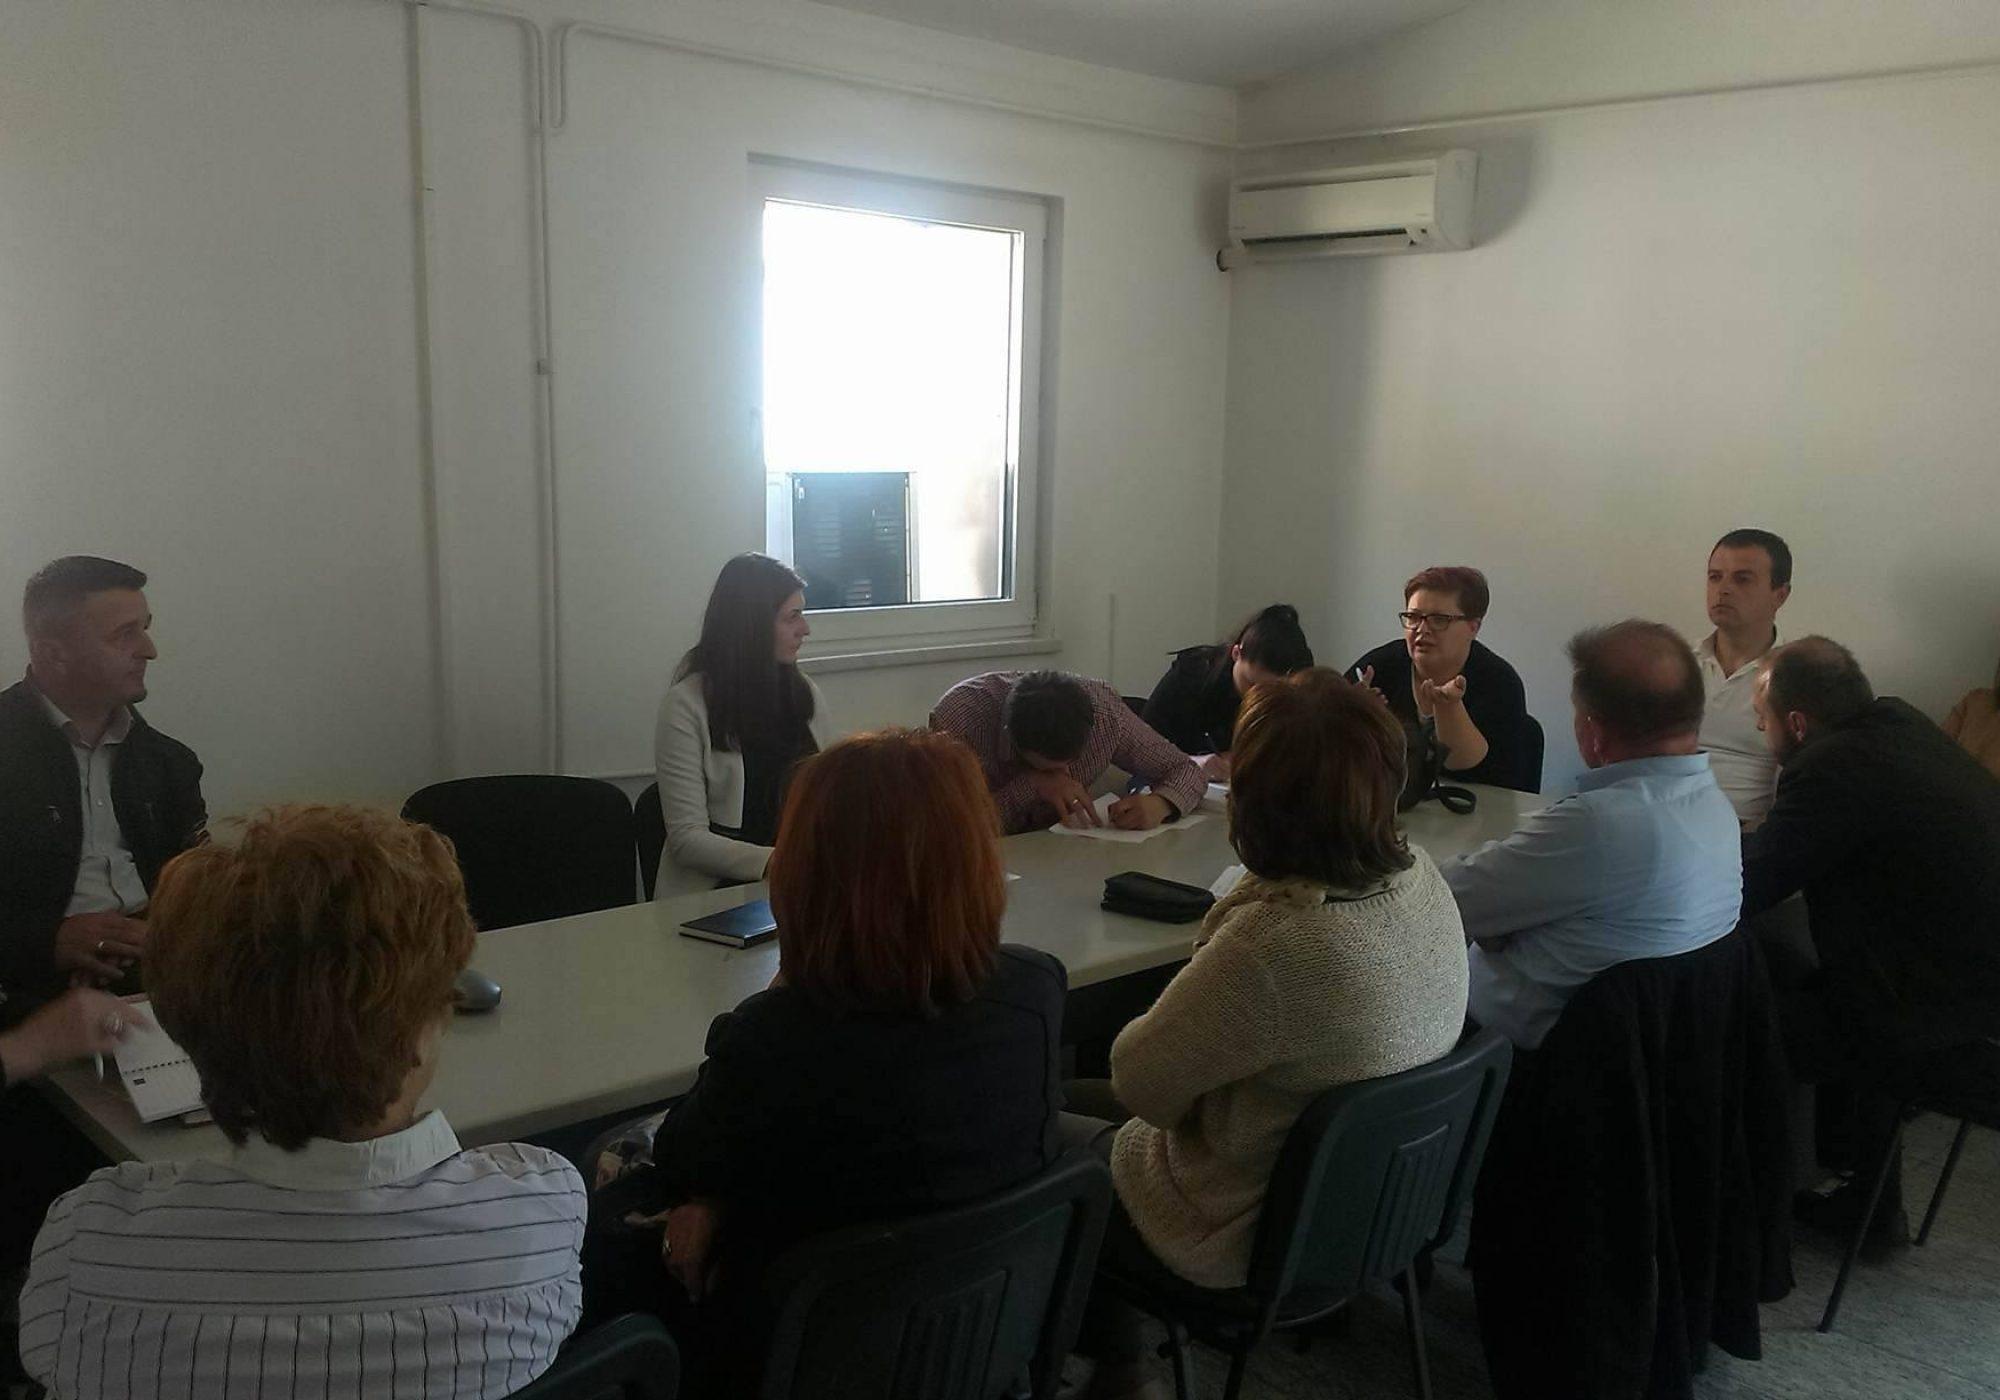 Održan sastanak Udruženja/Udruge socijalnih radnika SBK/KSB